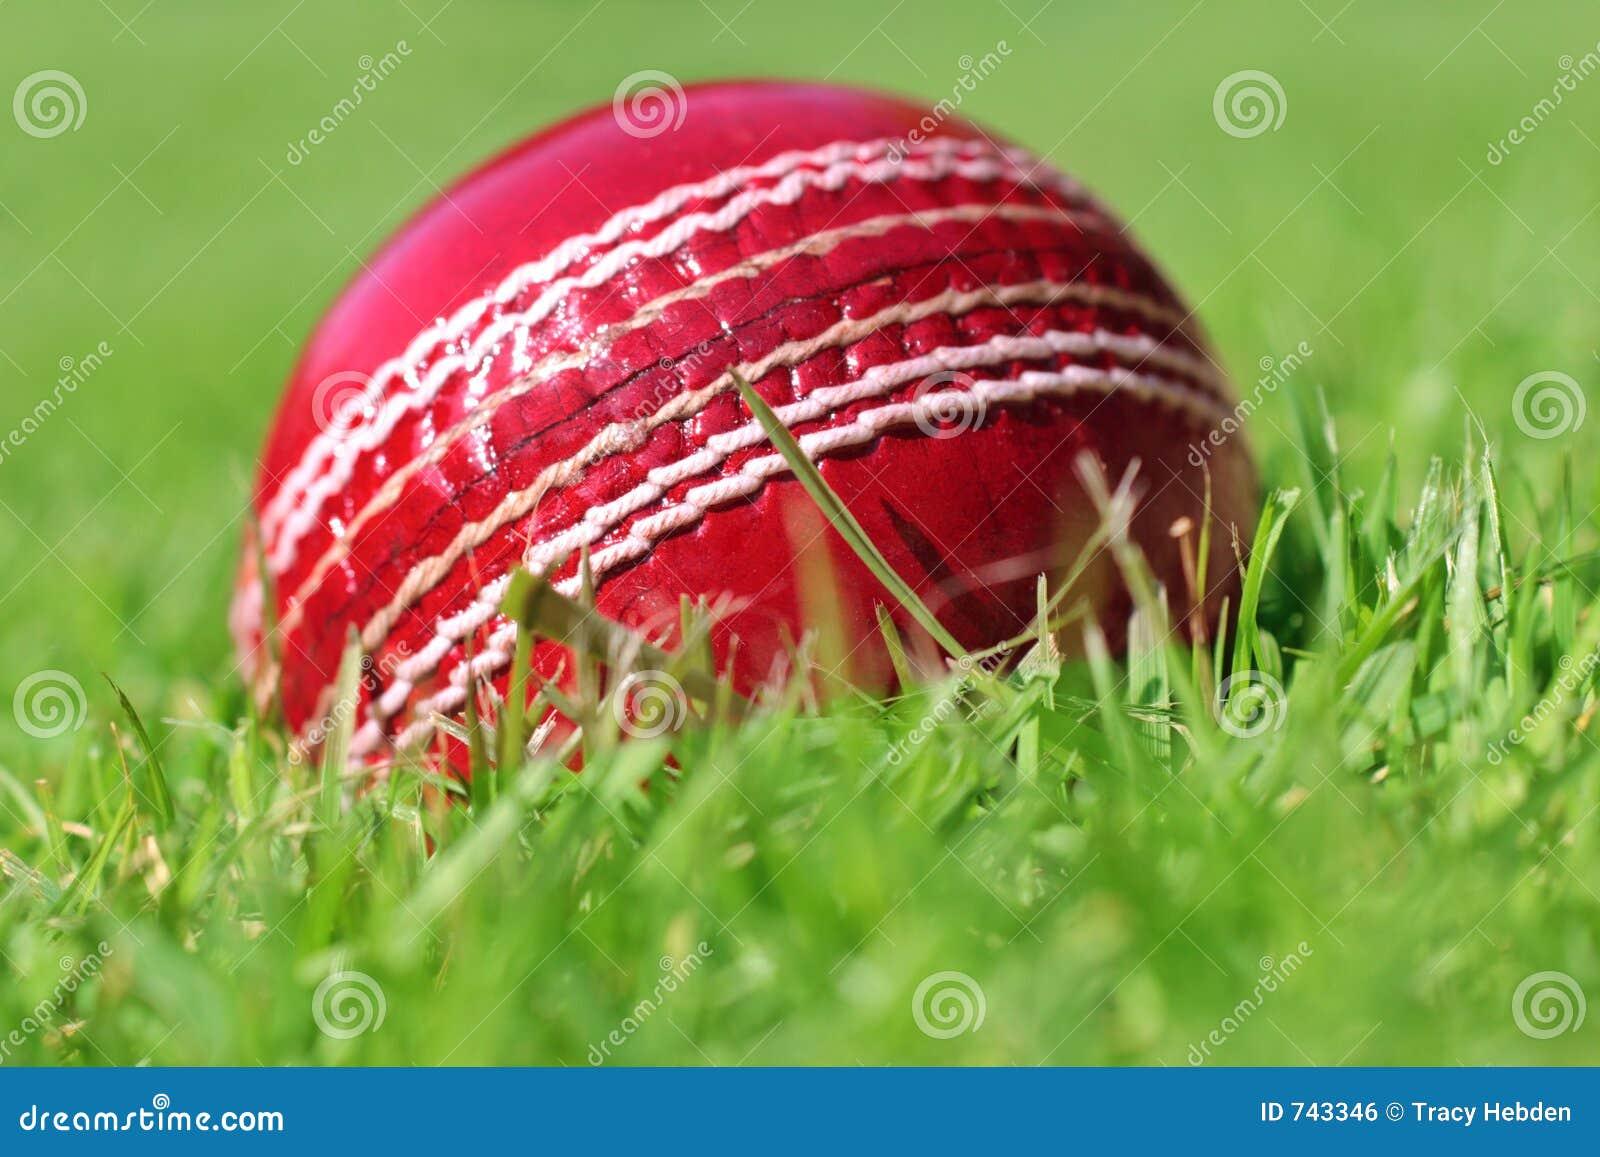 Cricket Ball Royalty Free Stock Image